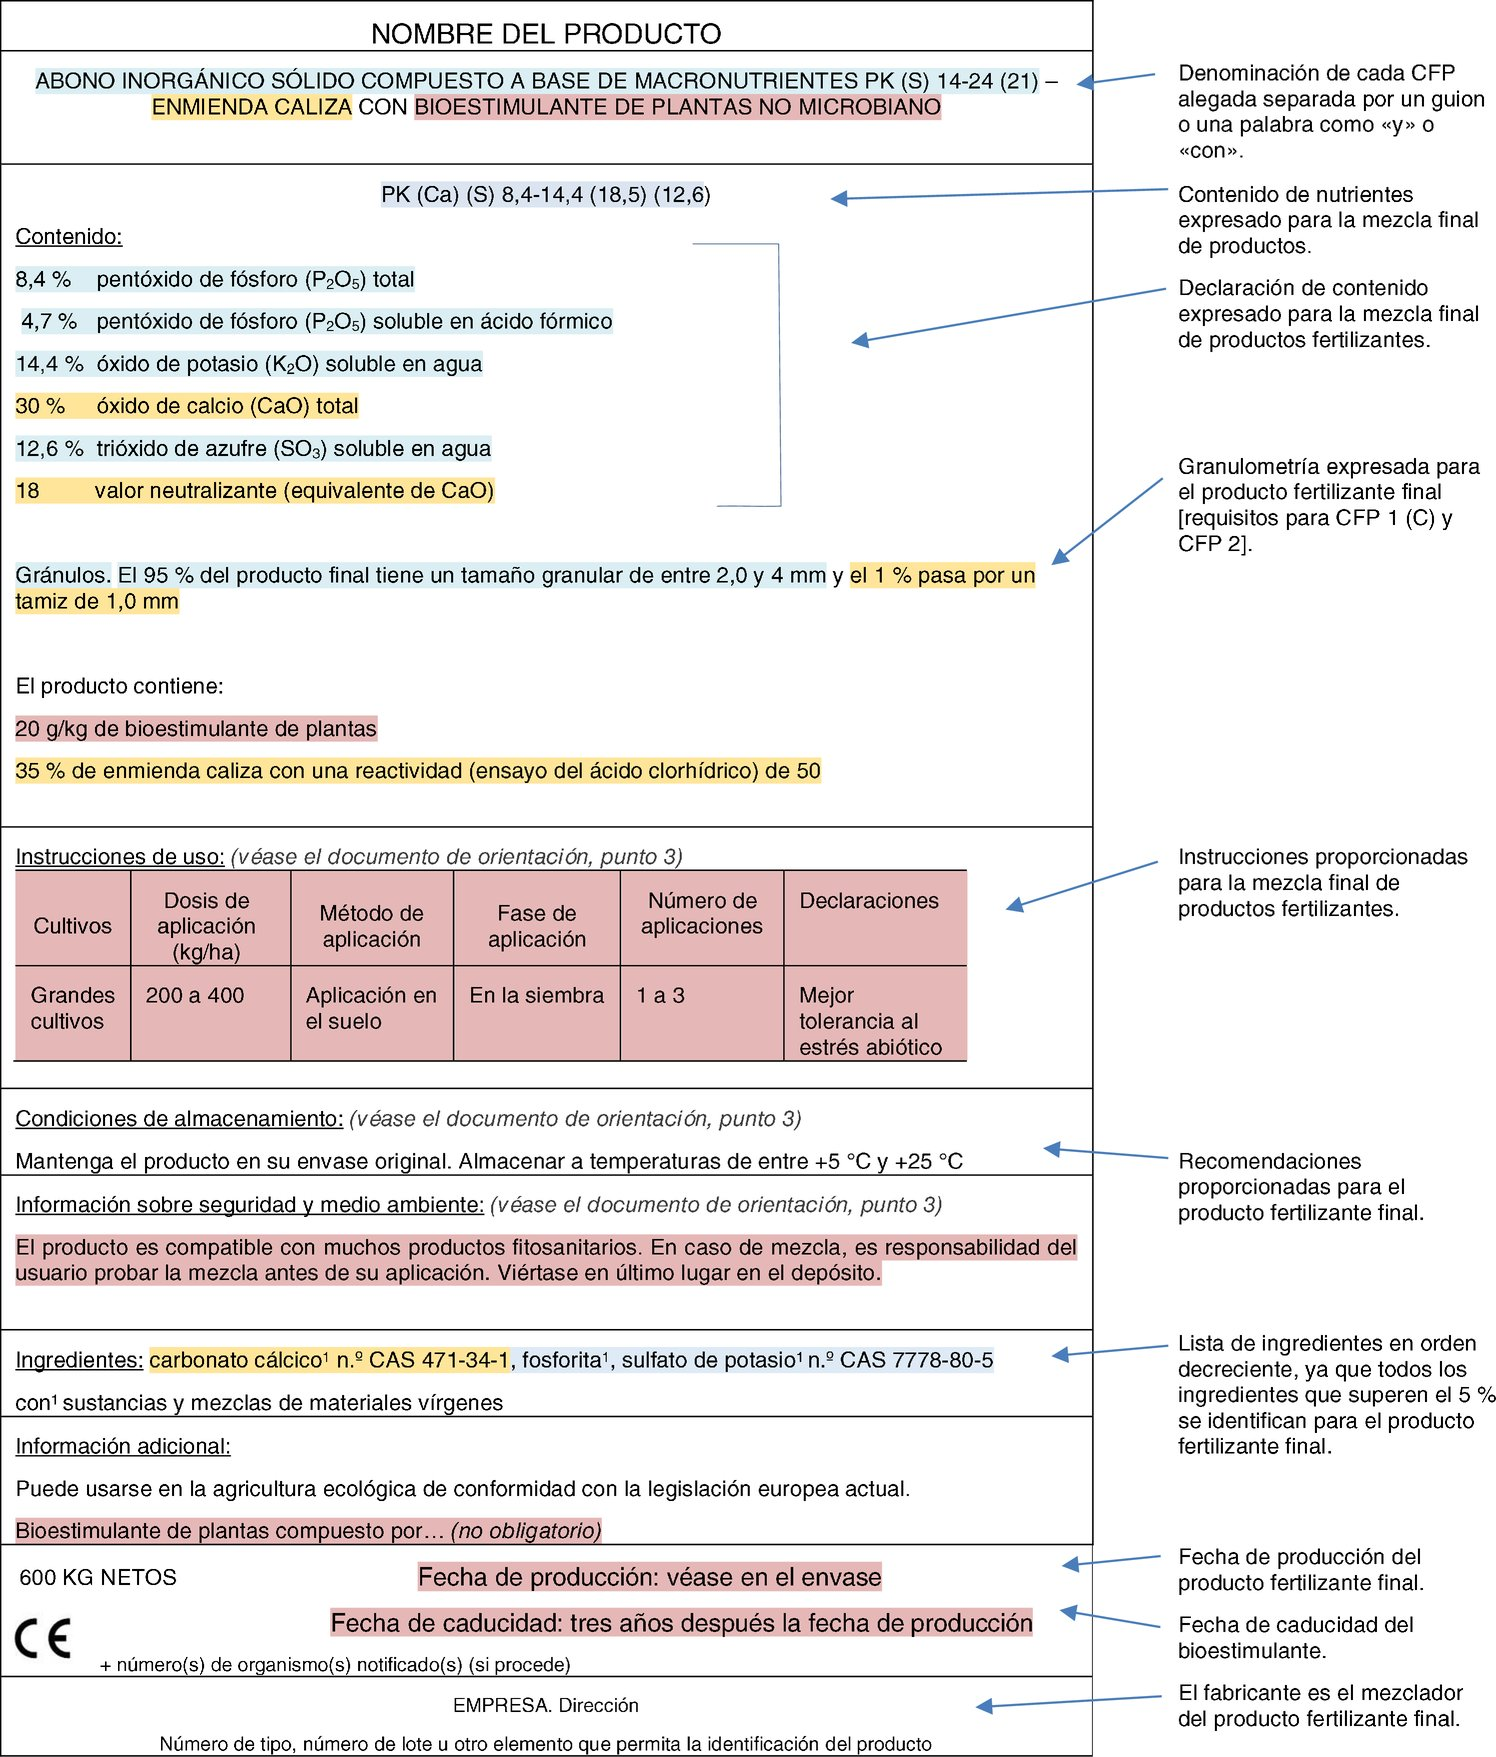 Imagen: http://publications.europa.eu/resource/uriserv/OJ.C_.2021.119.01.0001.01.SPA.xhtml.C_2021119ES.01004201.tif.jpg